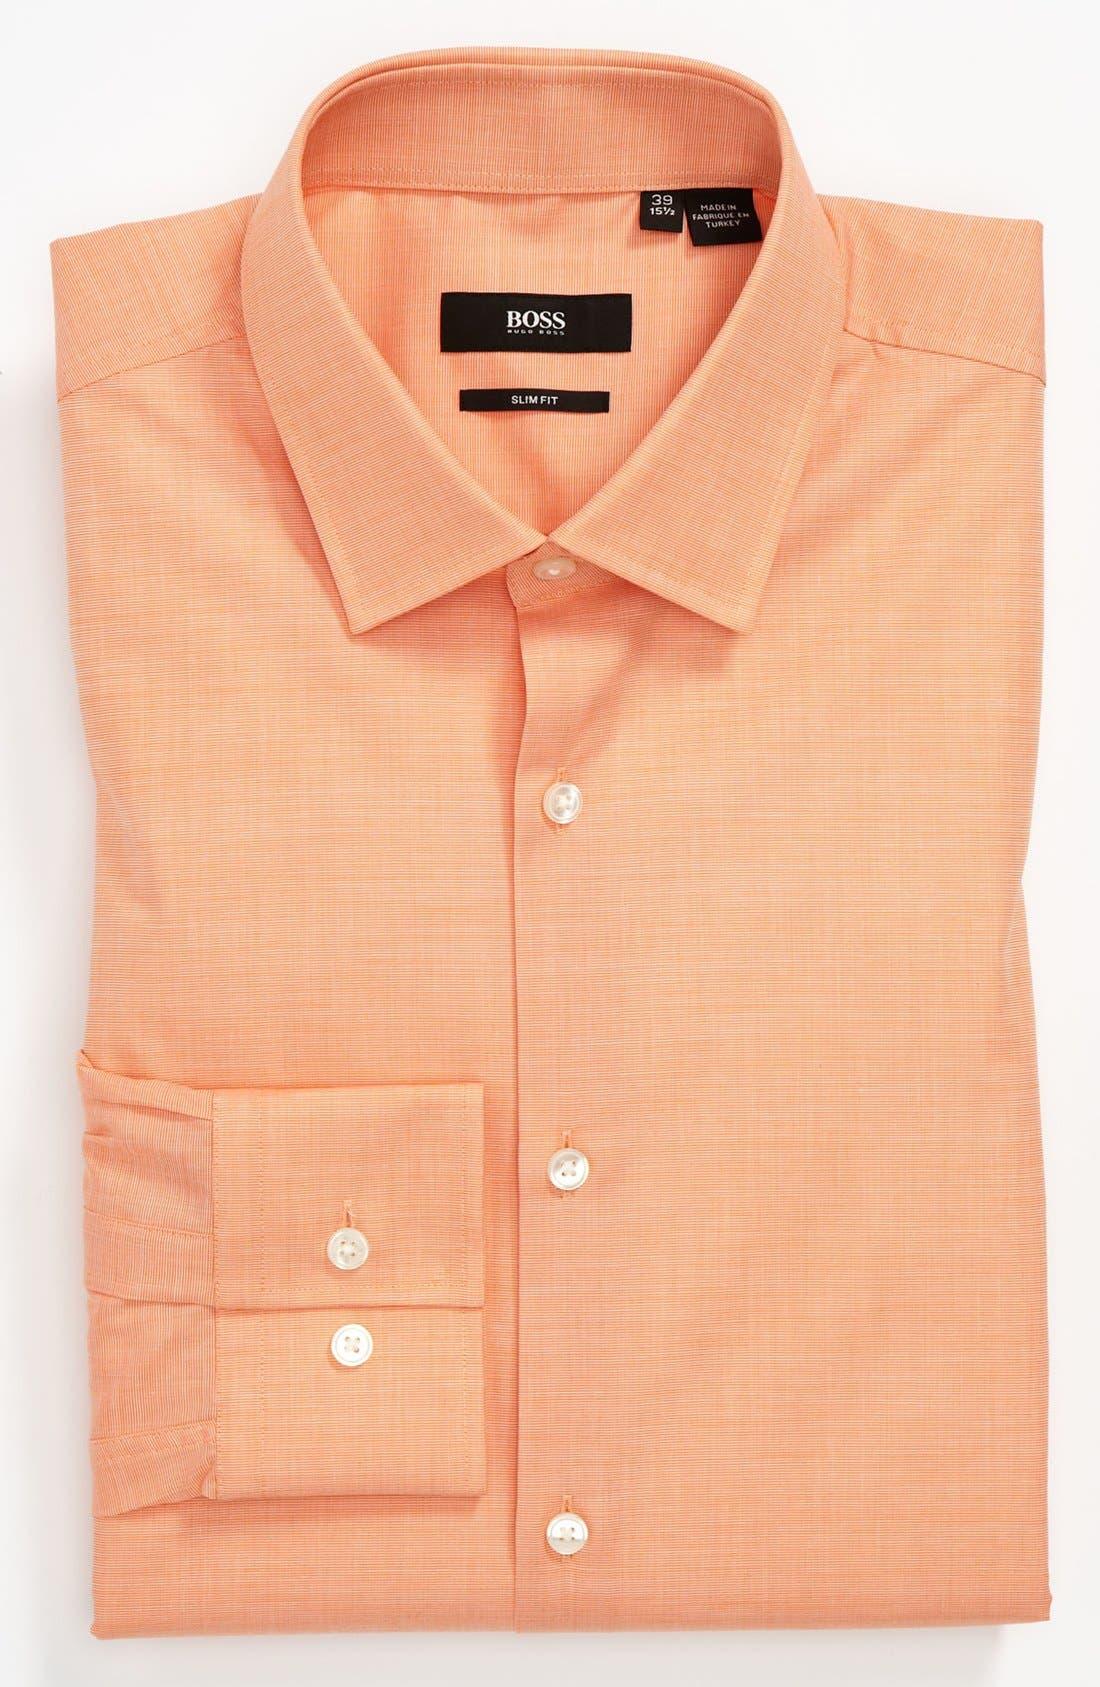 HUGO BOSS Slim Fit Dress Shirt,                         Main,                         color, Orange